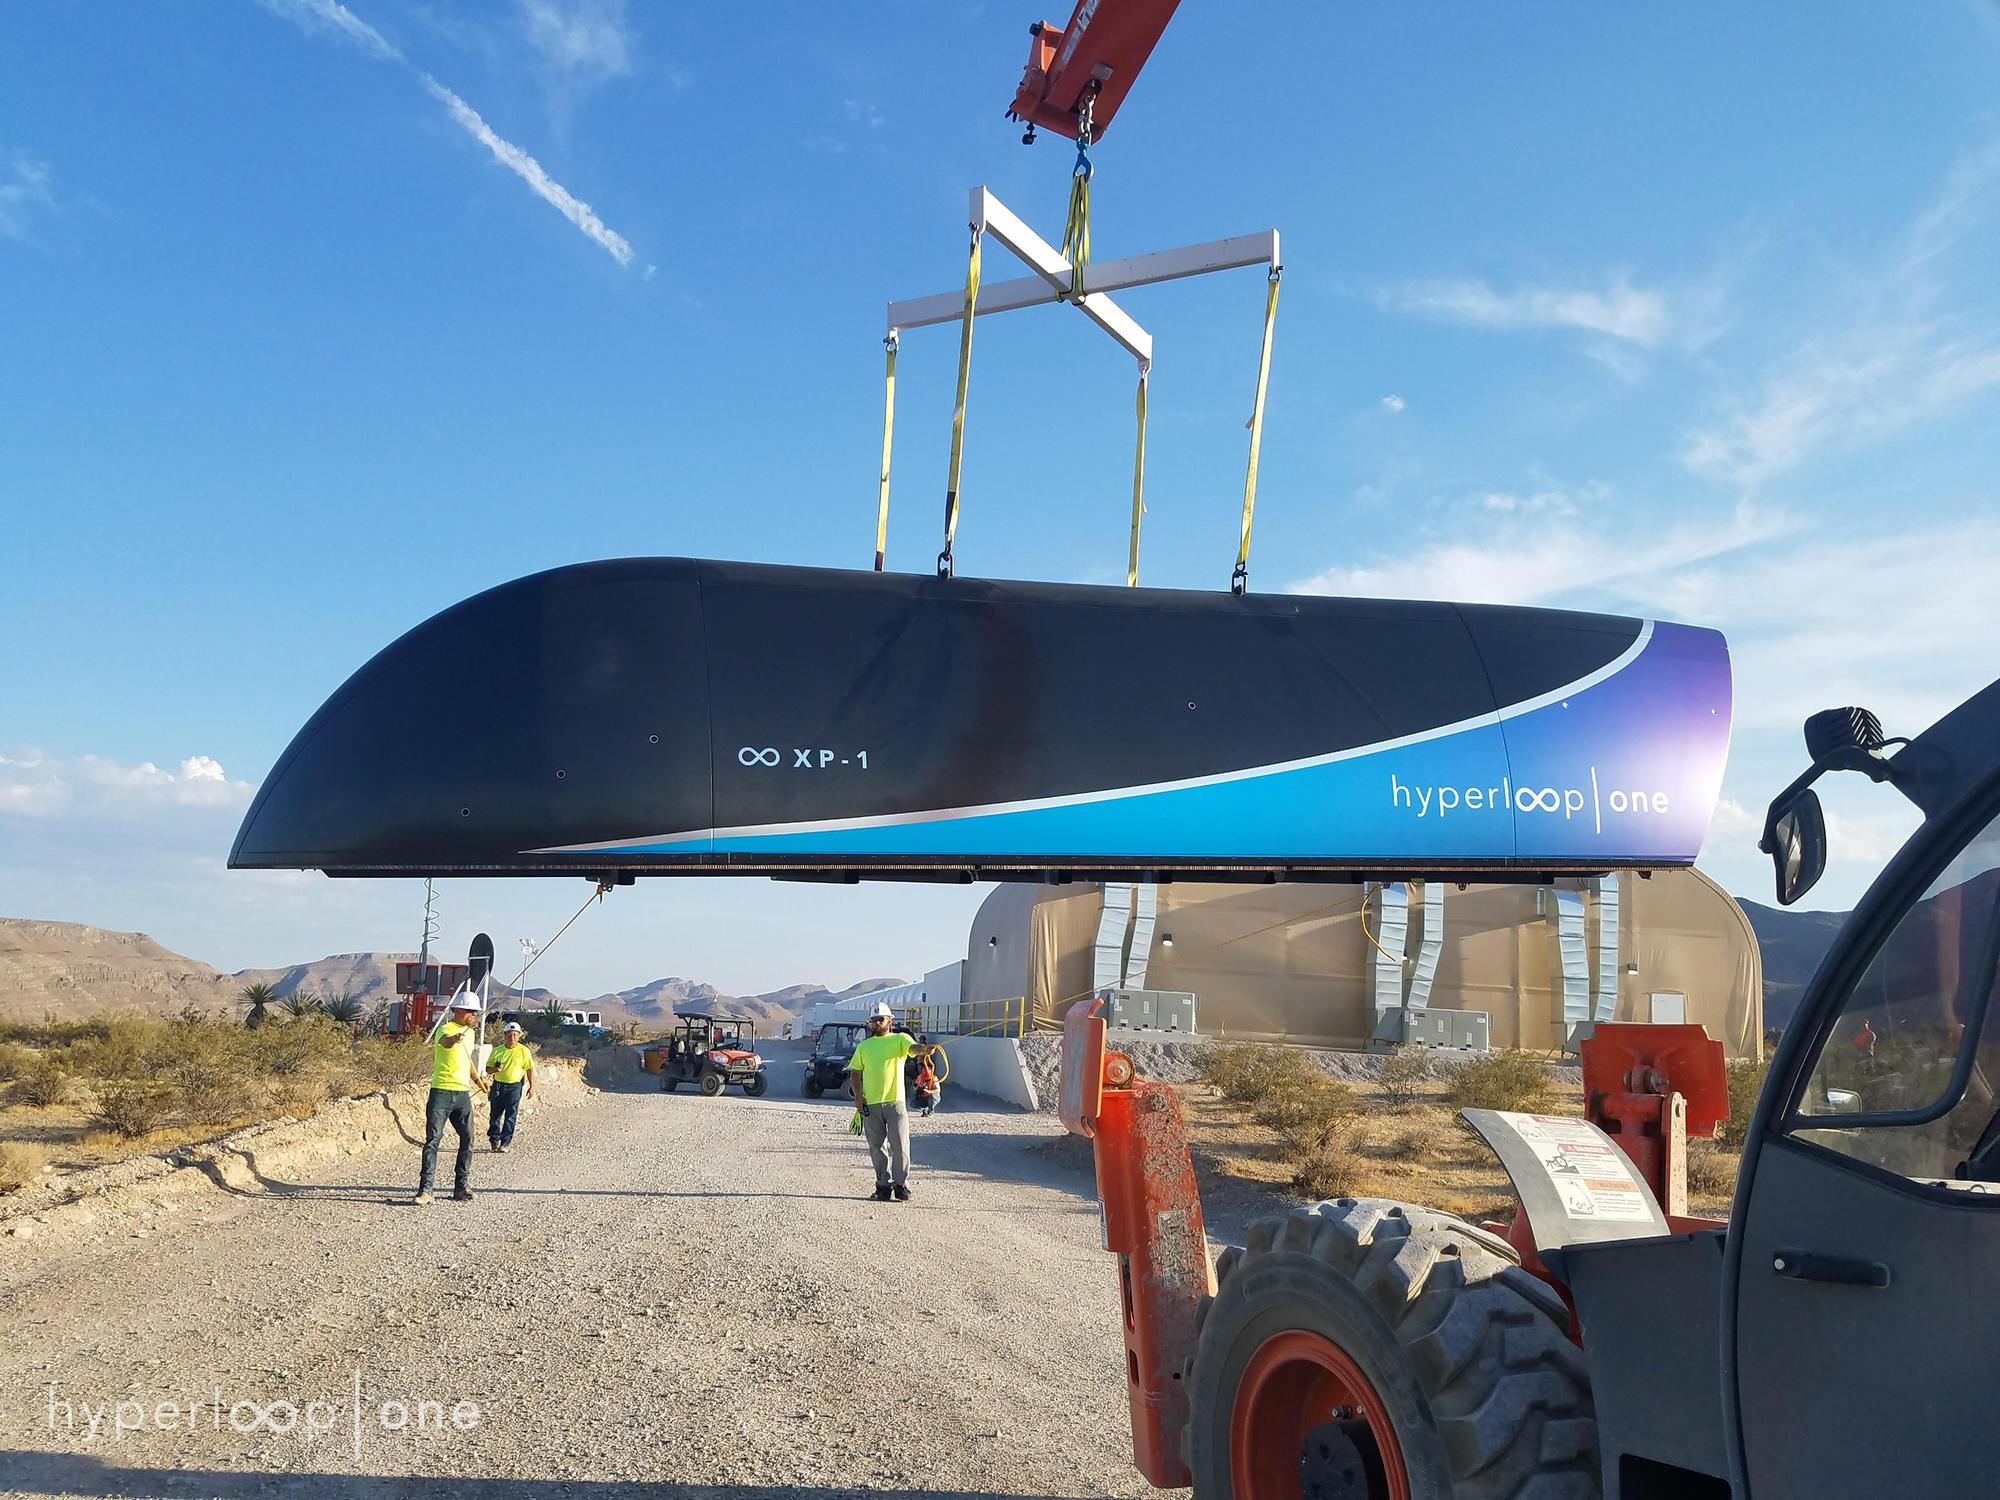 Imagen Hyperloop vs T-Flight: el transporte del futuro se mide en Kilómetros/hora